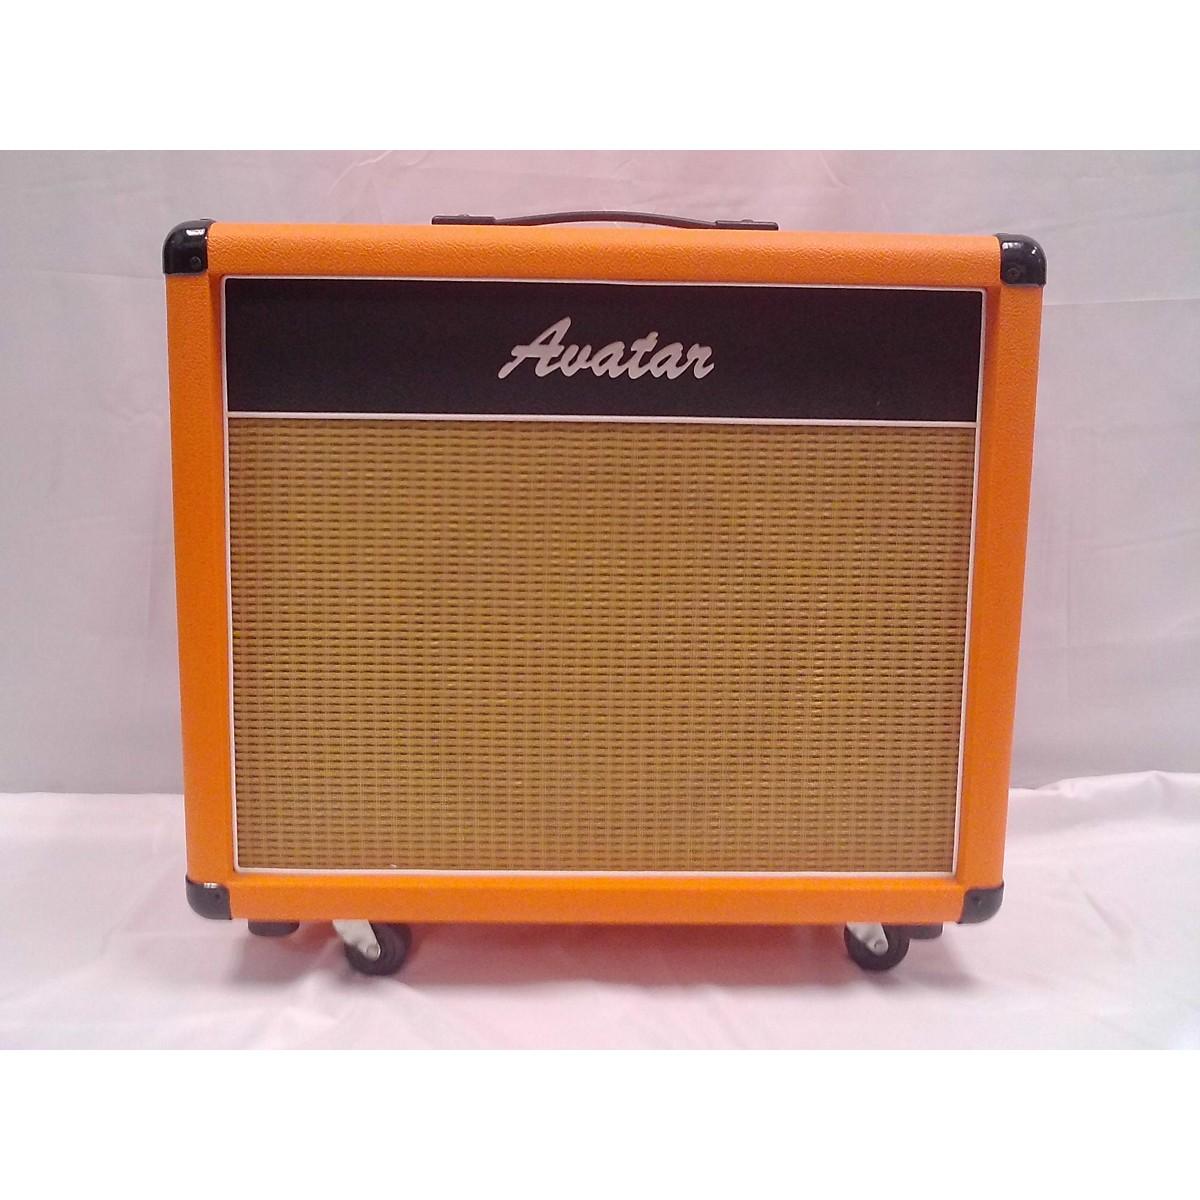 Avatar G112 Vintage Guitar Cabinet